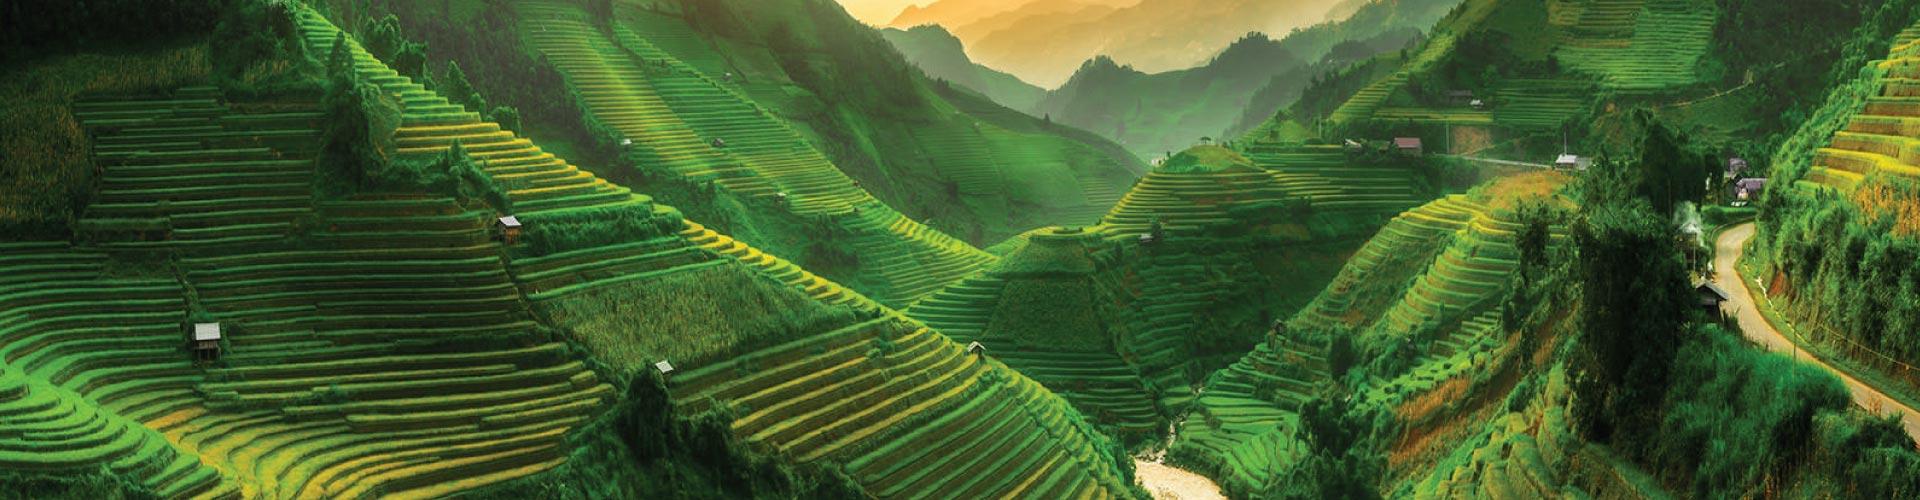 Hanoi & Ha Long Bay Day Cruise + Sa Pa Valley